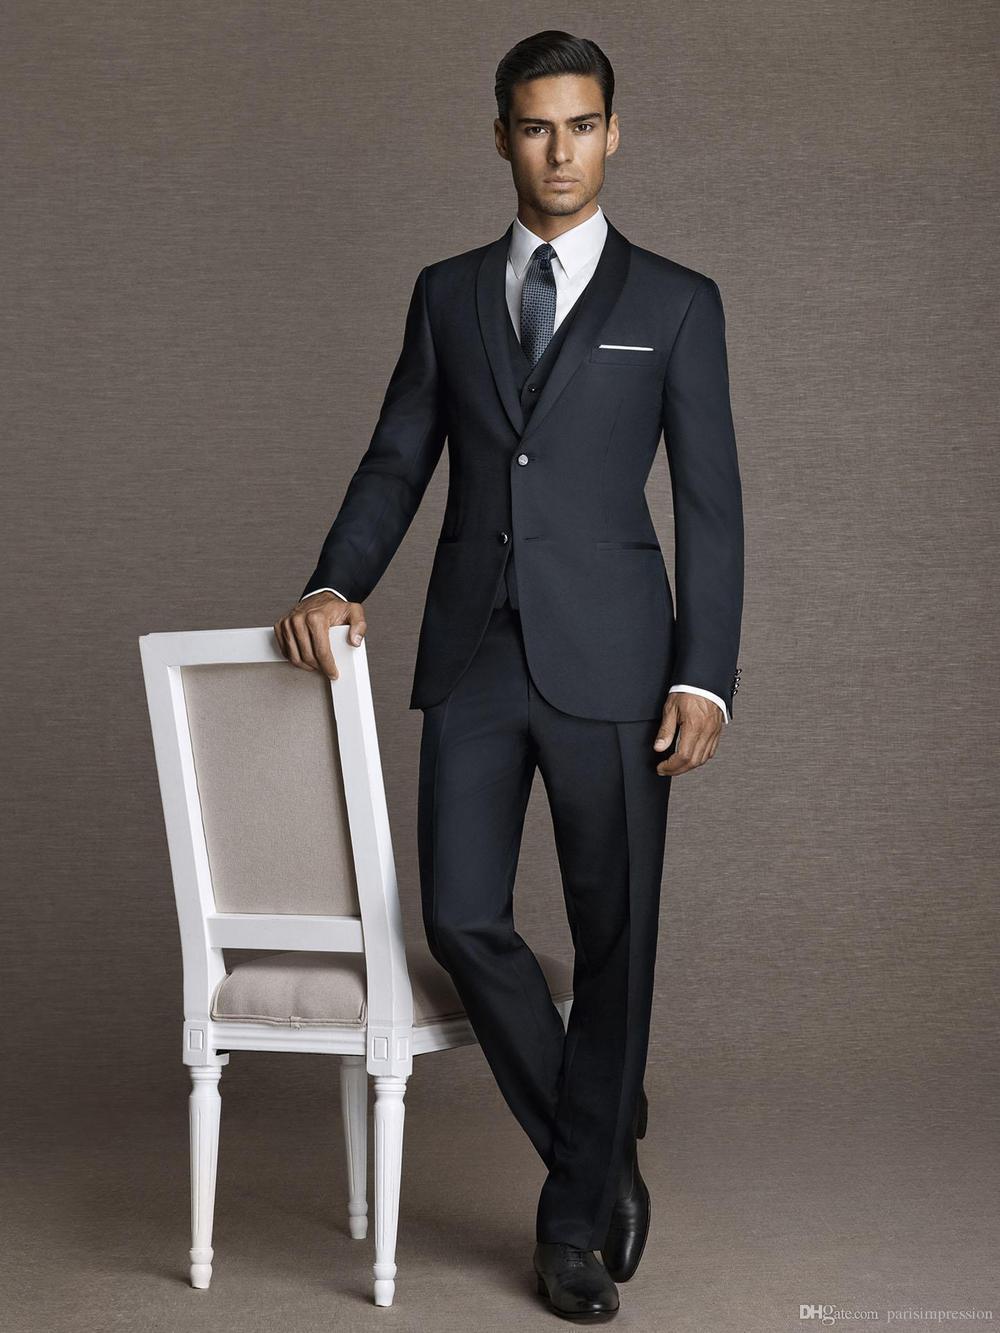 linen suits for destination weddings wedding suits Destination Wedding Suit Of The Week By Justlinen